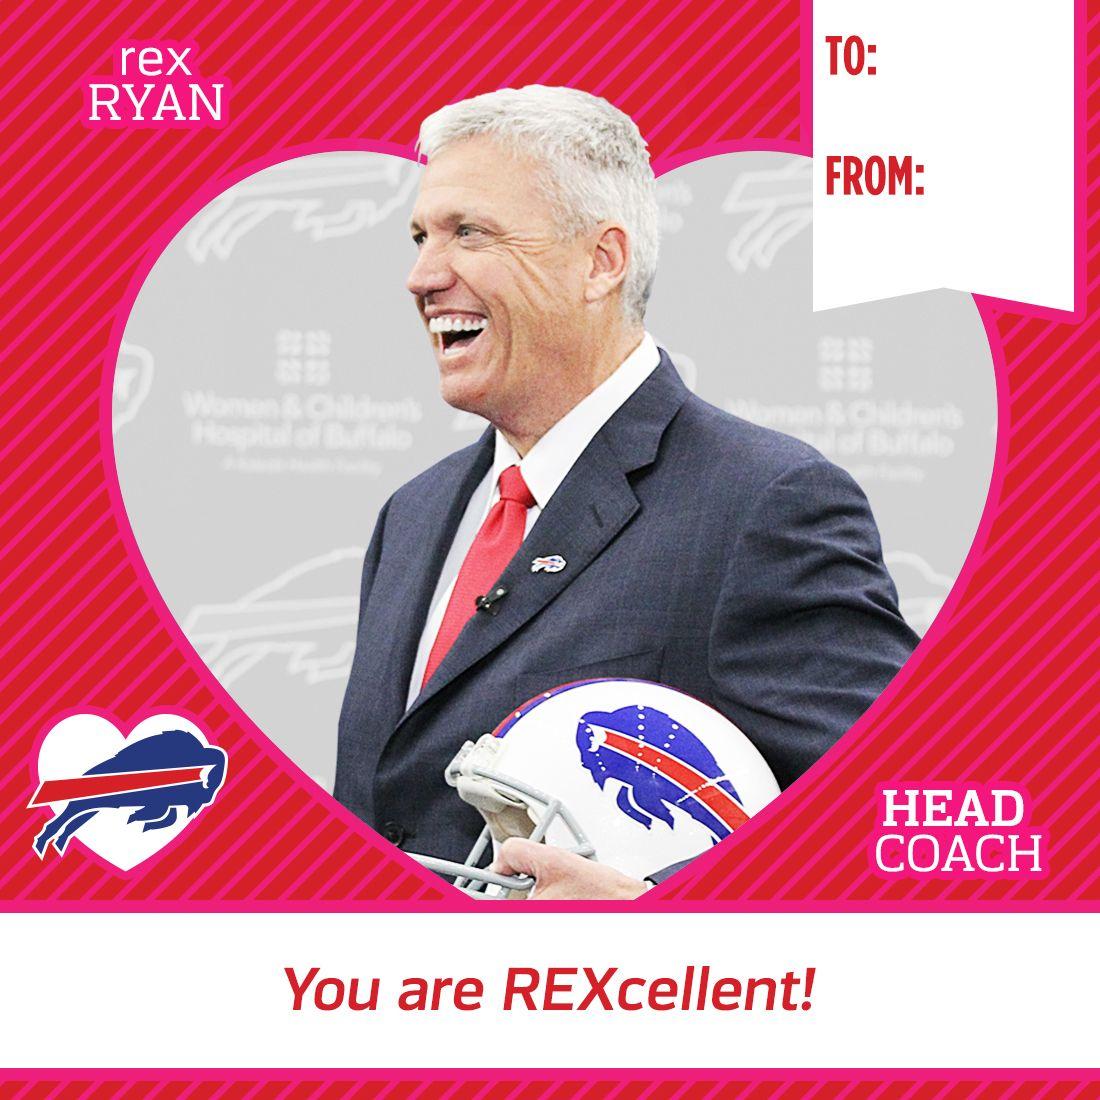 Printable Valentine's Day Cards | Buffalo Bills | Buffalo